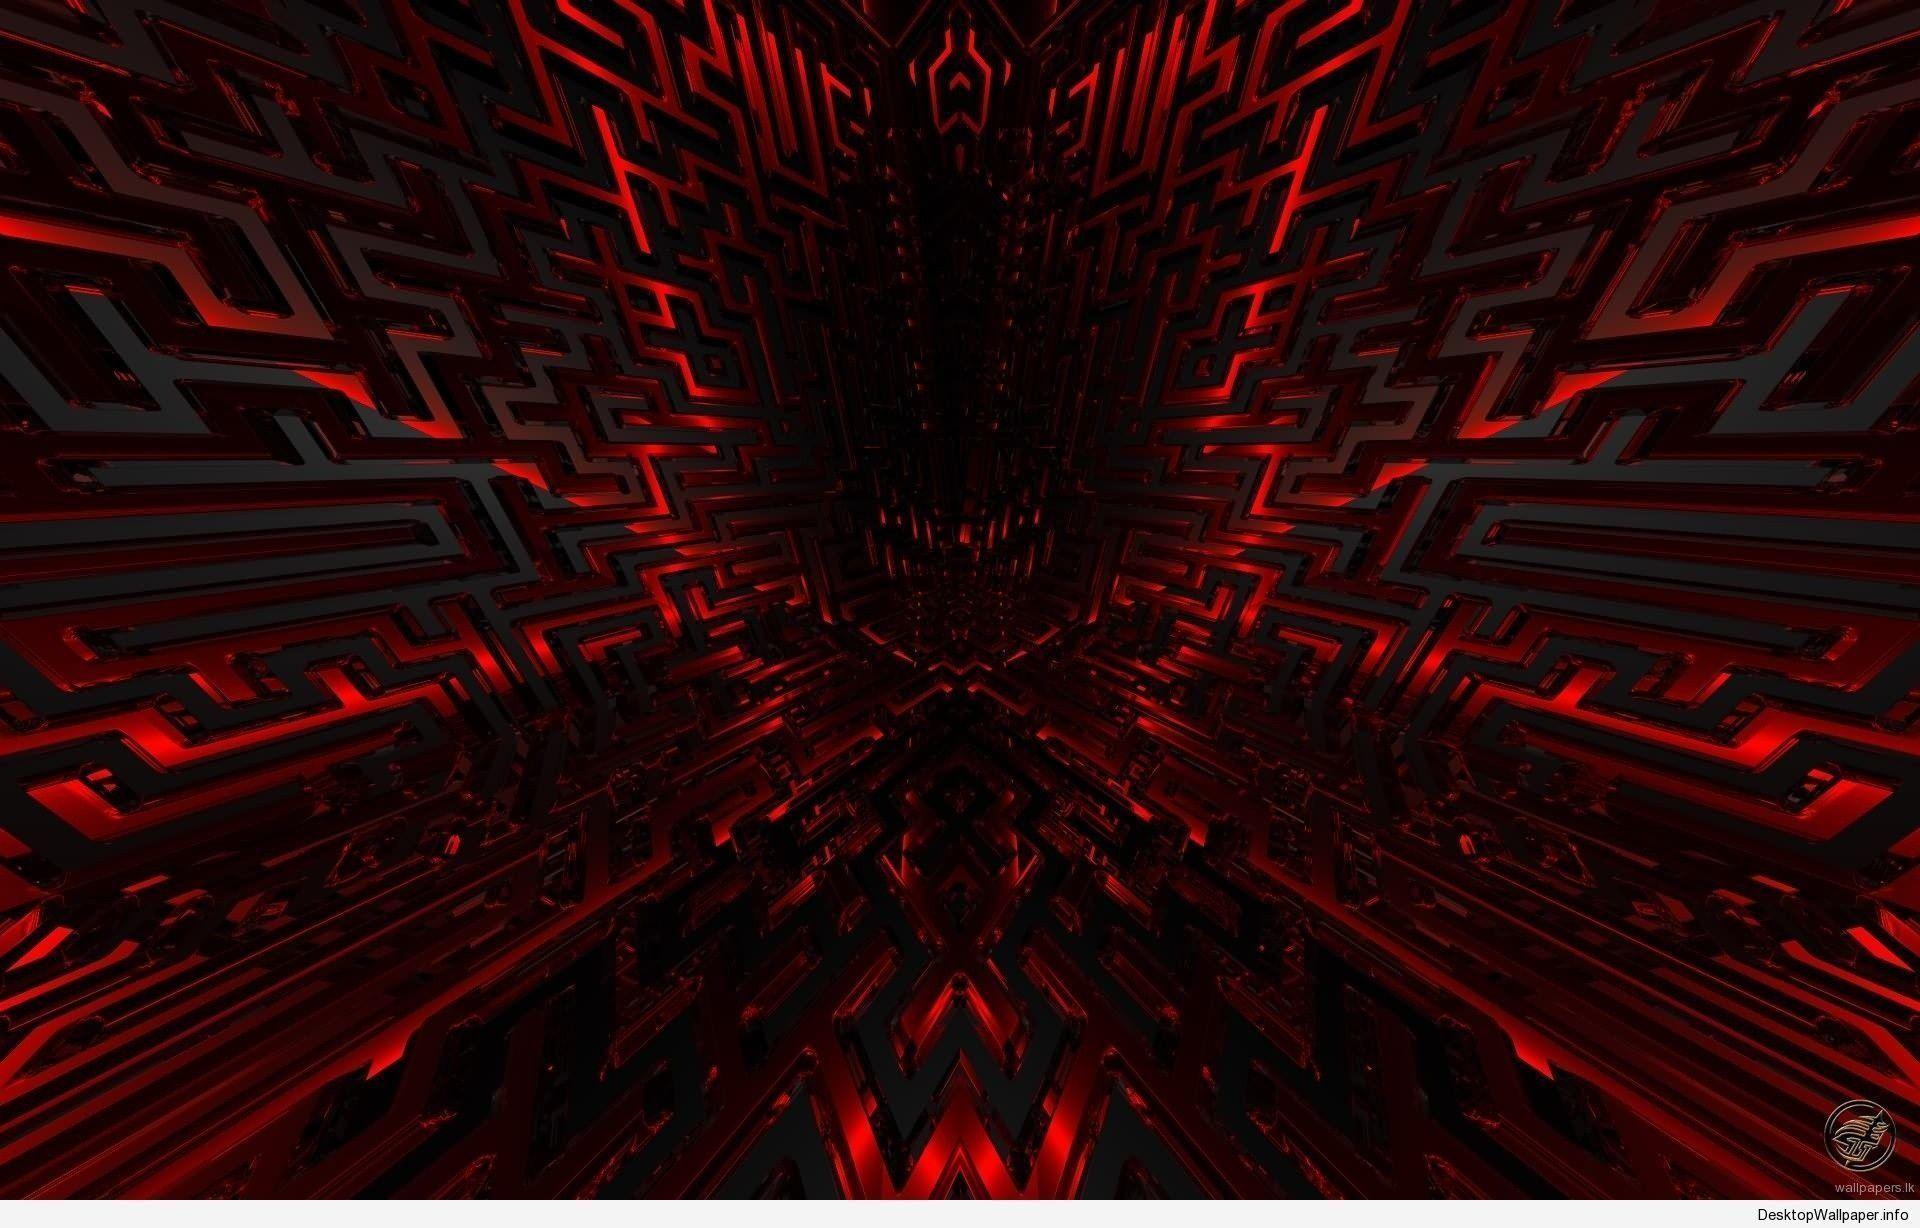 Red And Black Desktop Backgrounds Https Wallpapersko Com Red And Black Desktop Backgrounds H Red And Black Wallpaper Red And Black Background Red Wallpaper